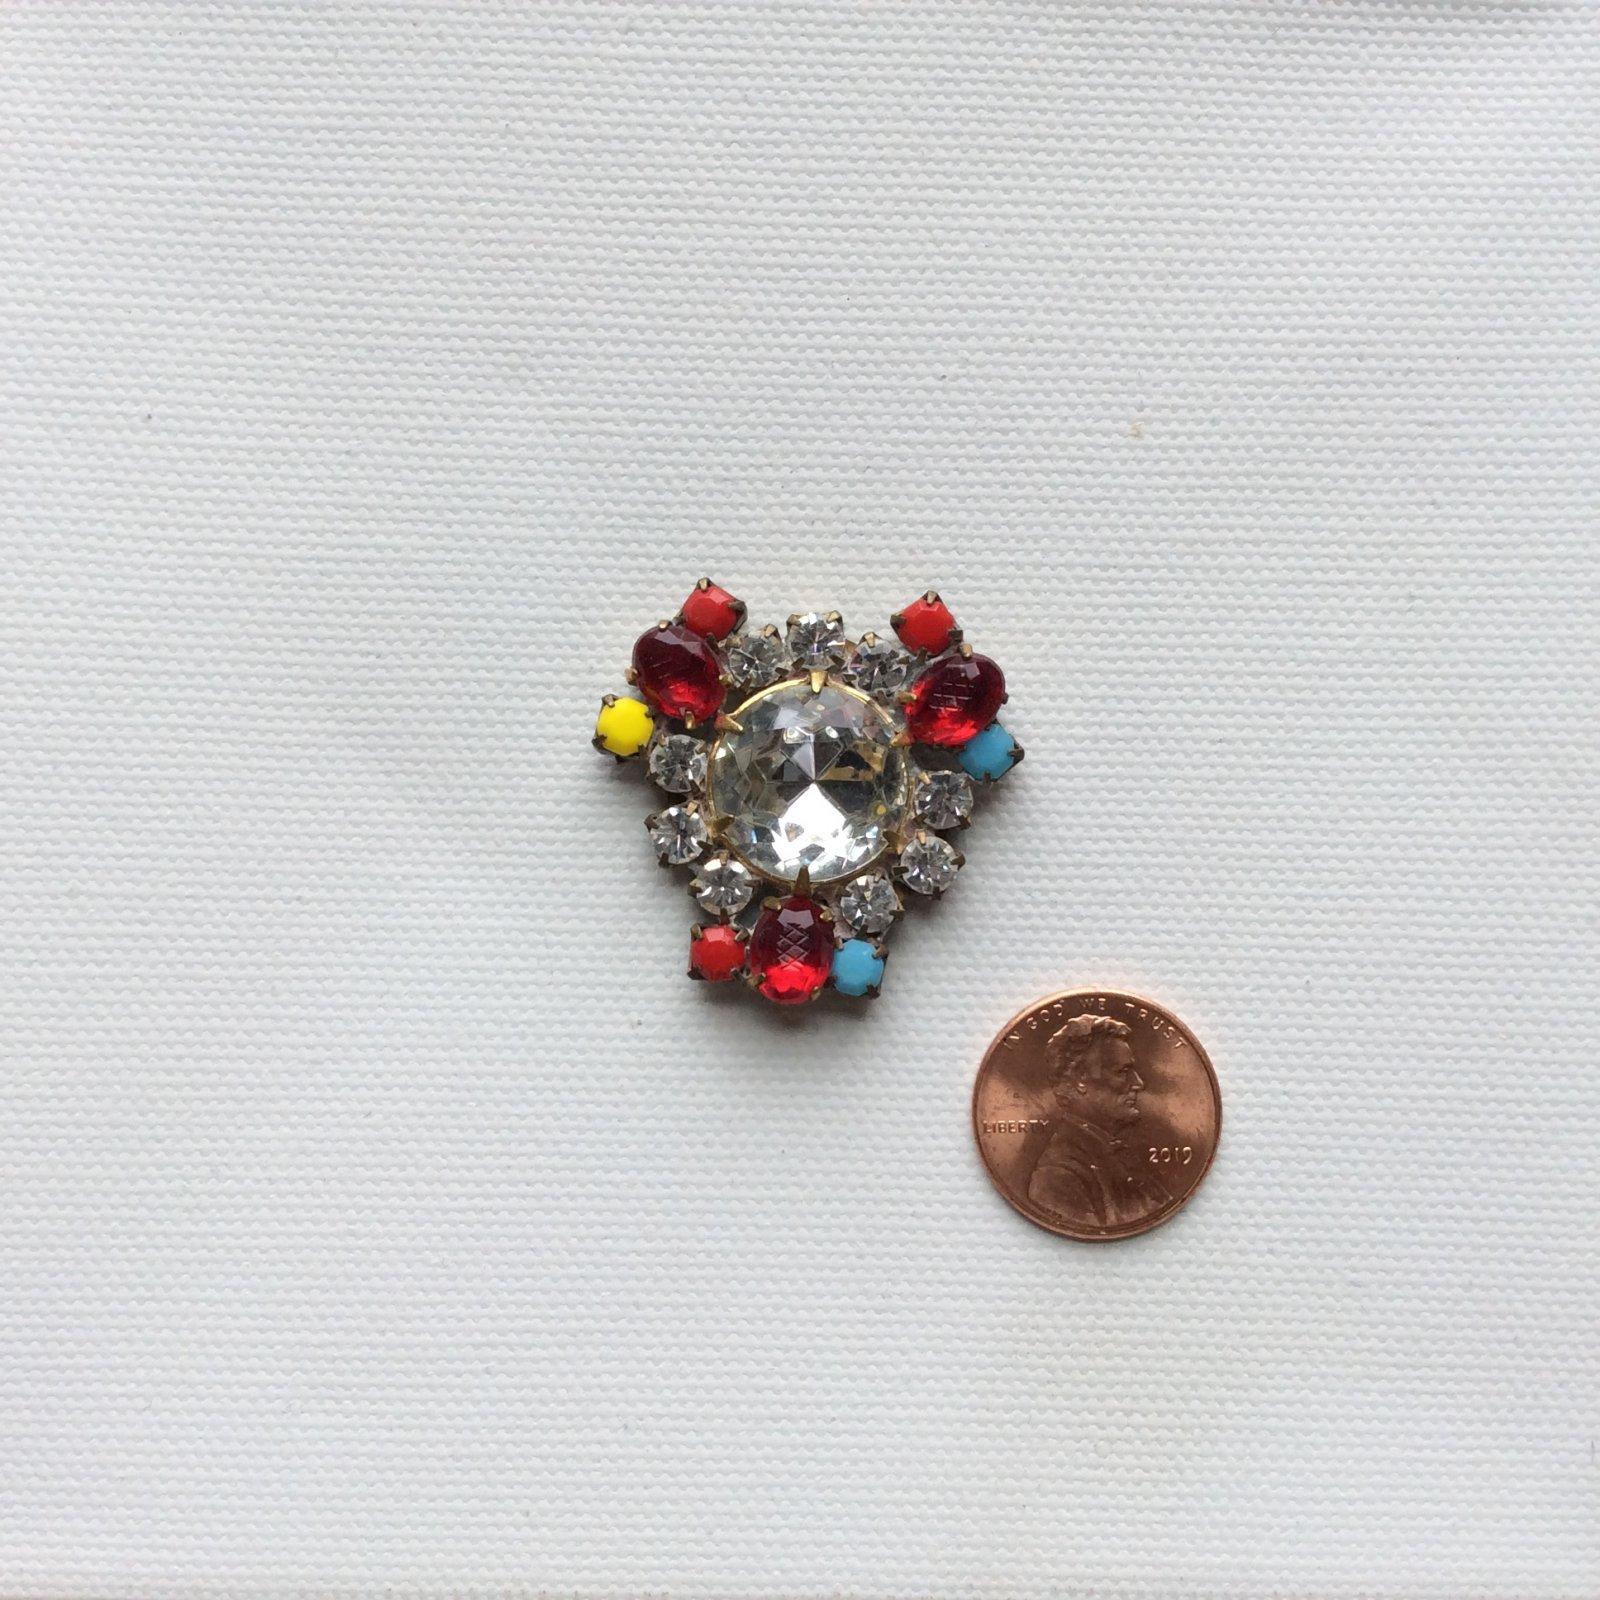 Vintage Czech Glass Rhinestone Jewelry Making Sew on Costume Jewelry Accent CZG037